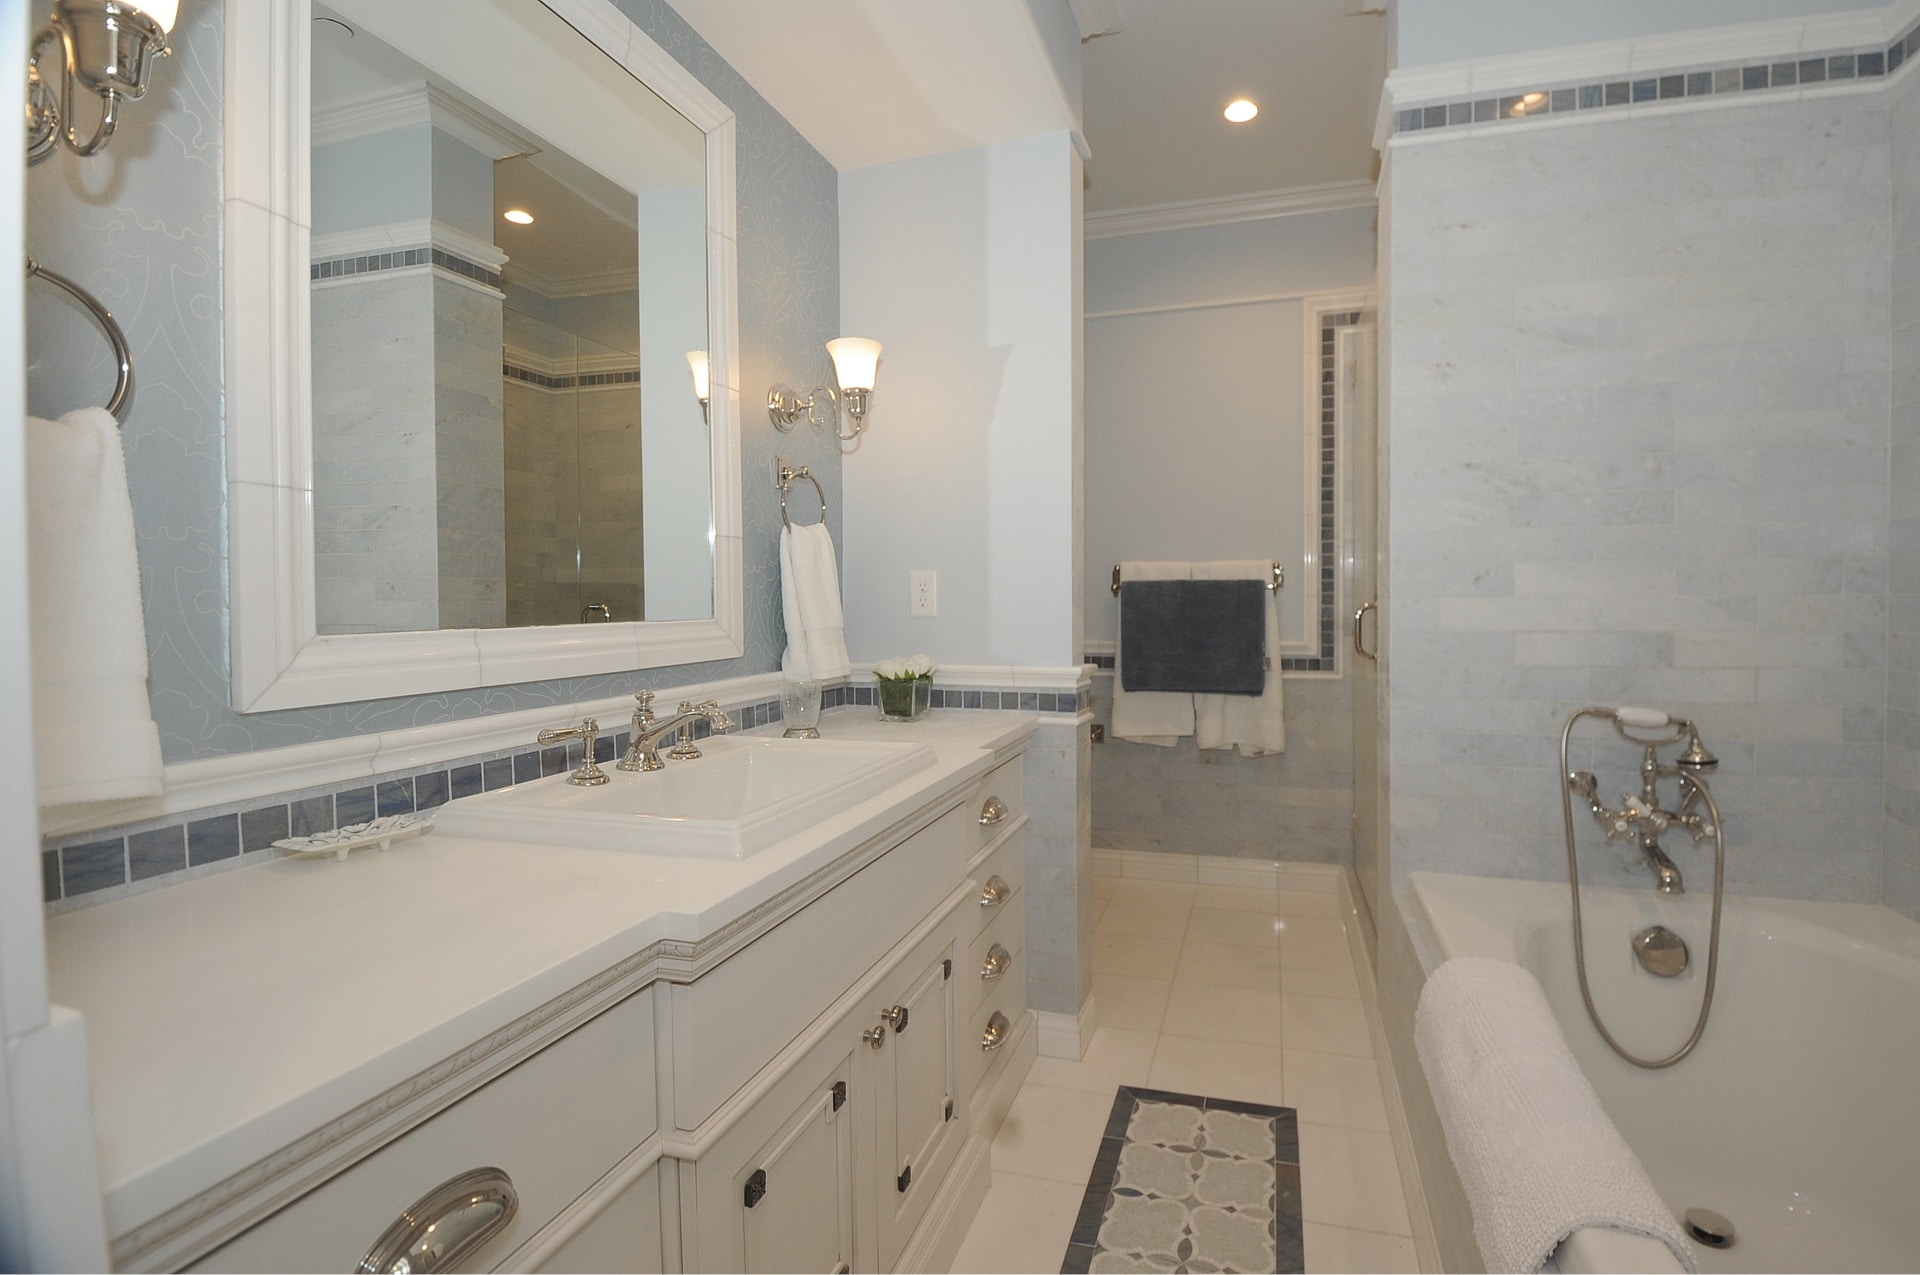 Woodside Avenue, bathroom - architectural design by Elliott Workgroup